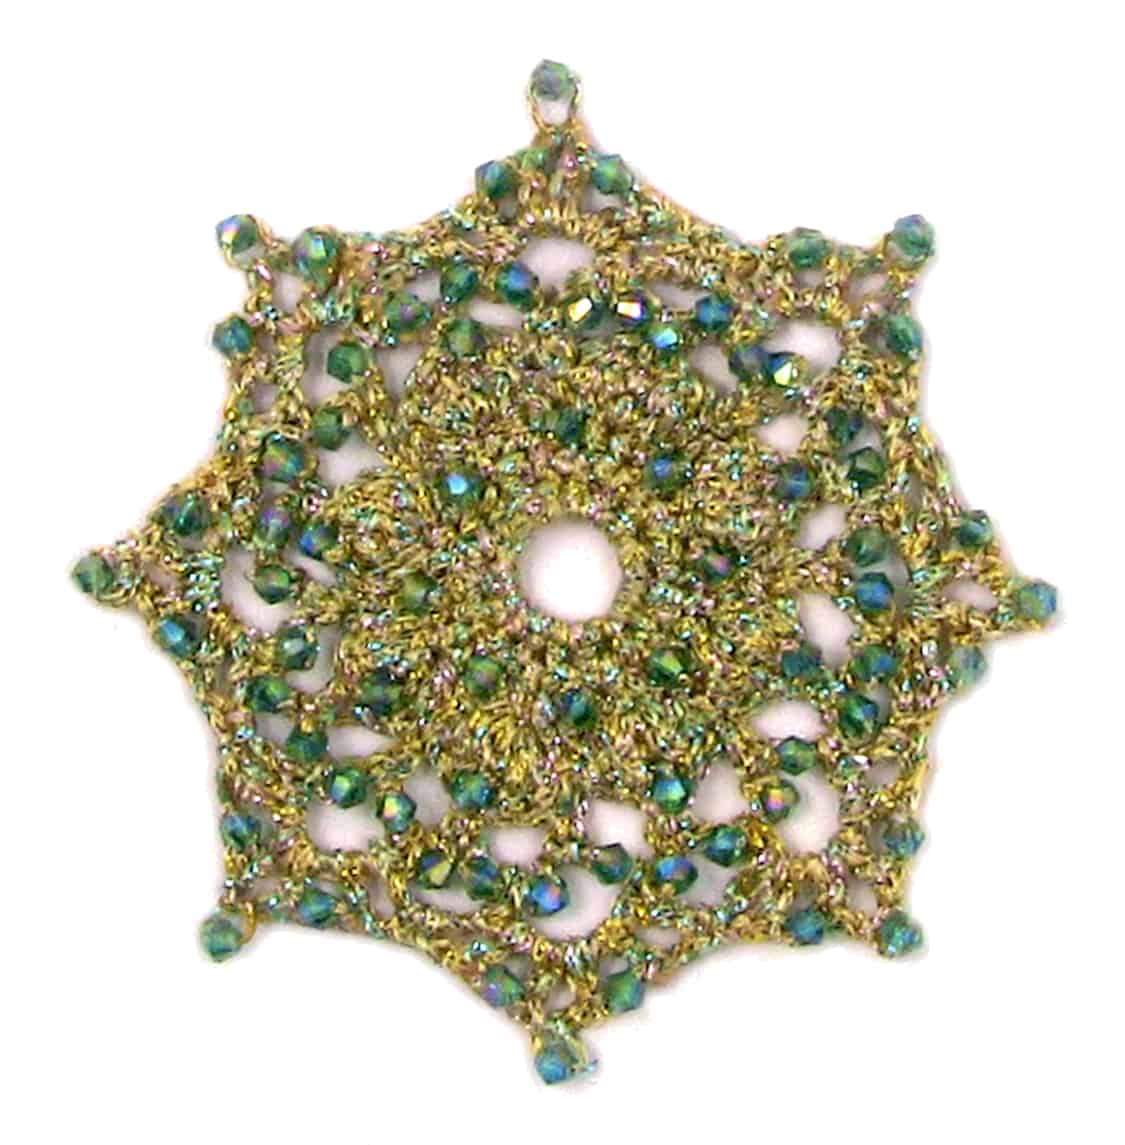 Beaded crochet ornaments